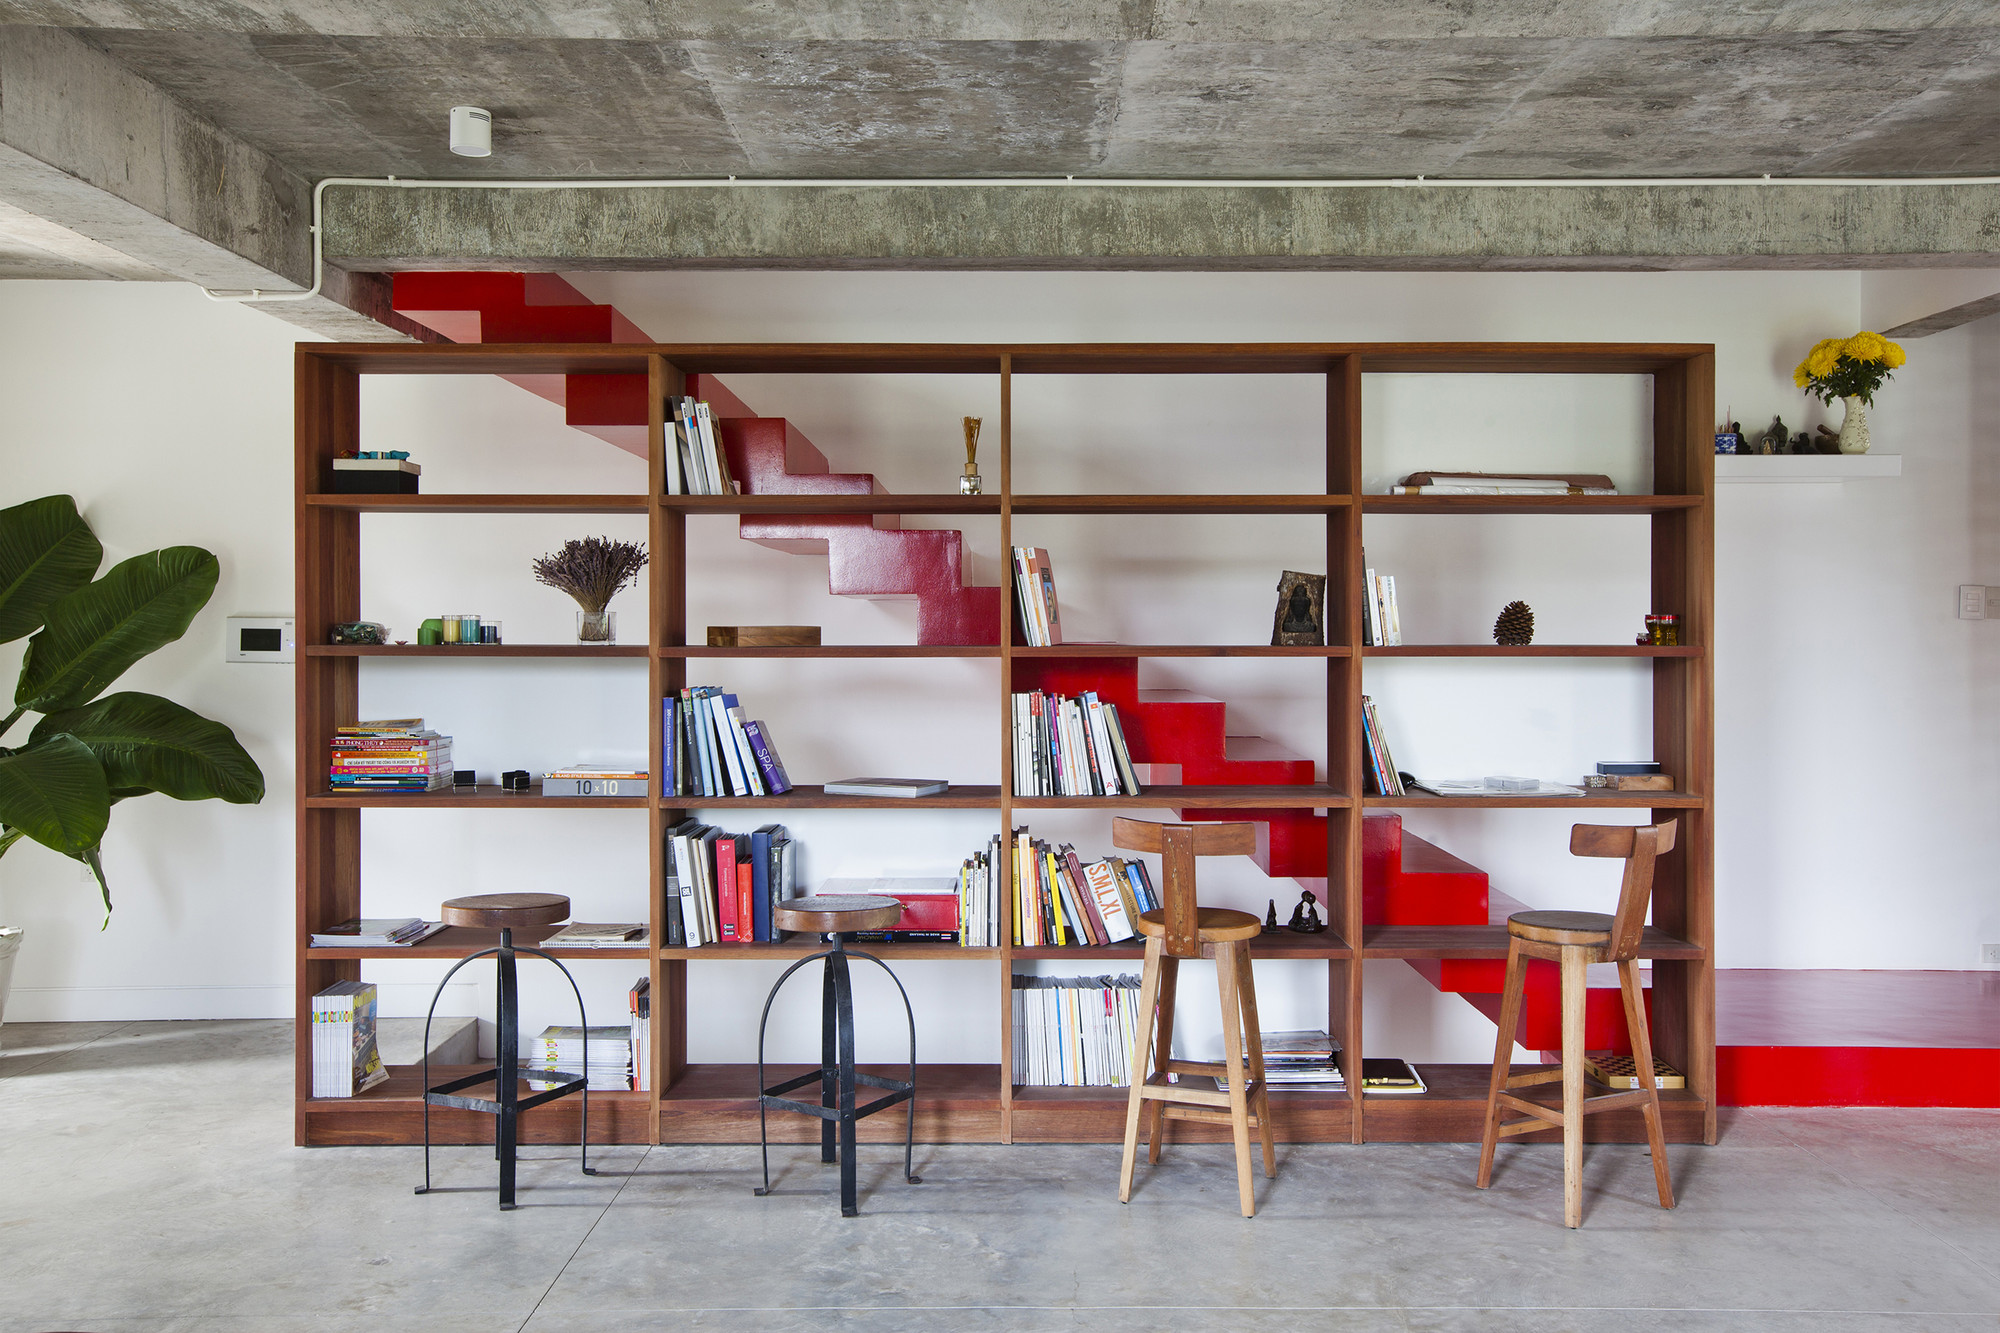 Casa MM / MM++ architects, © Hiroyuki Oki